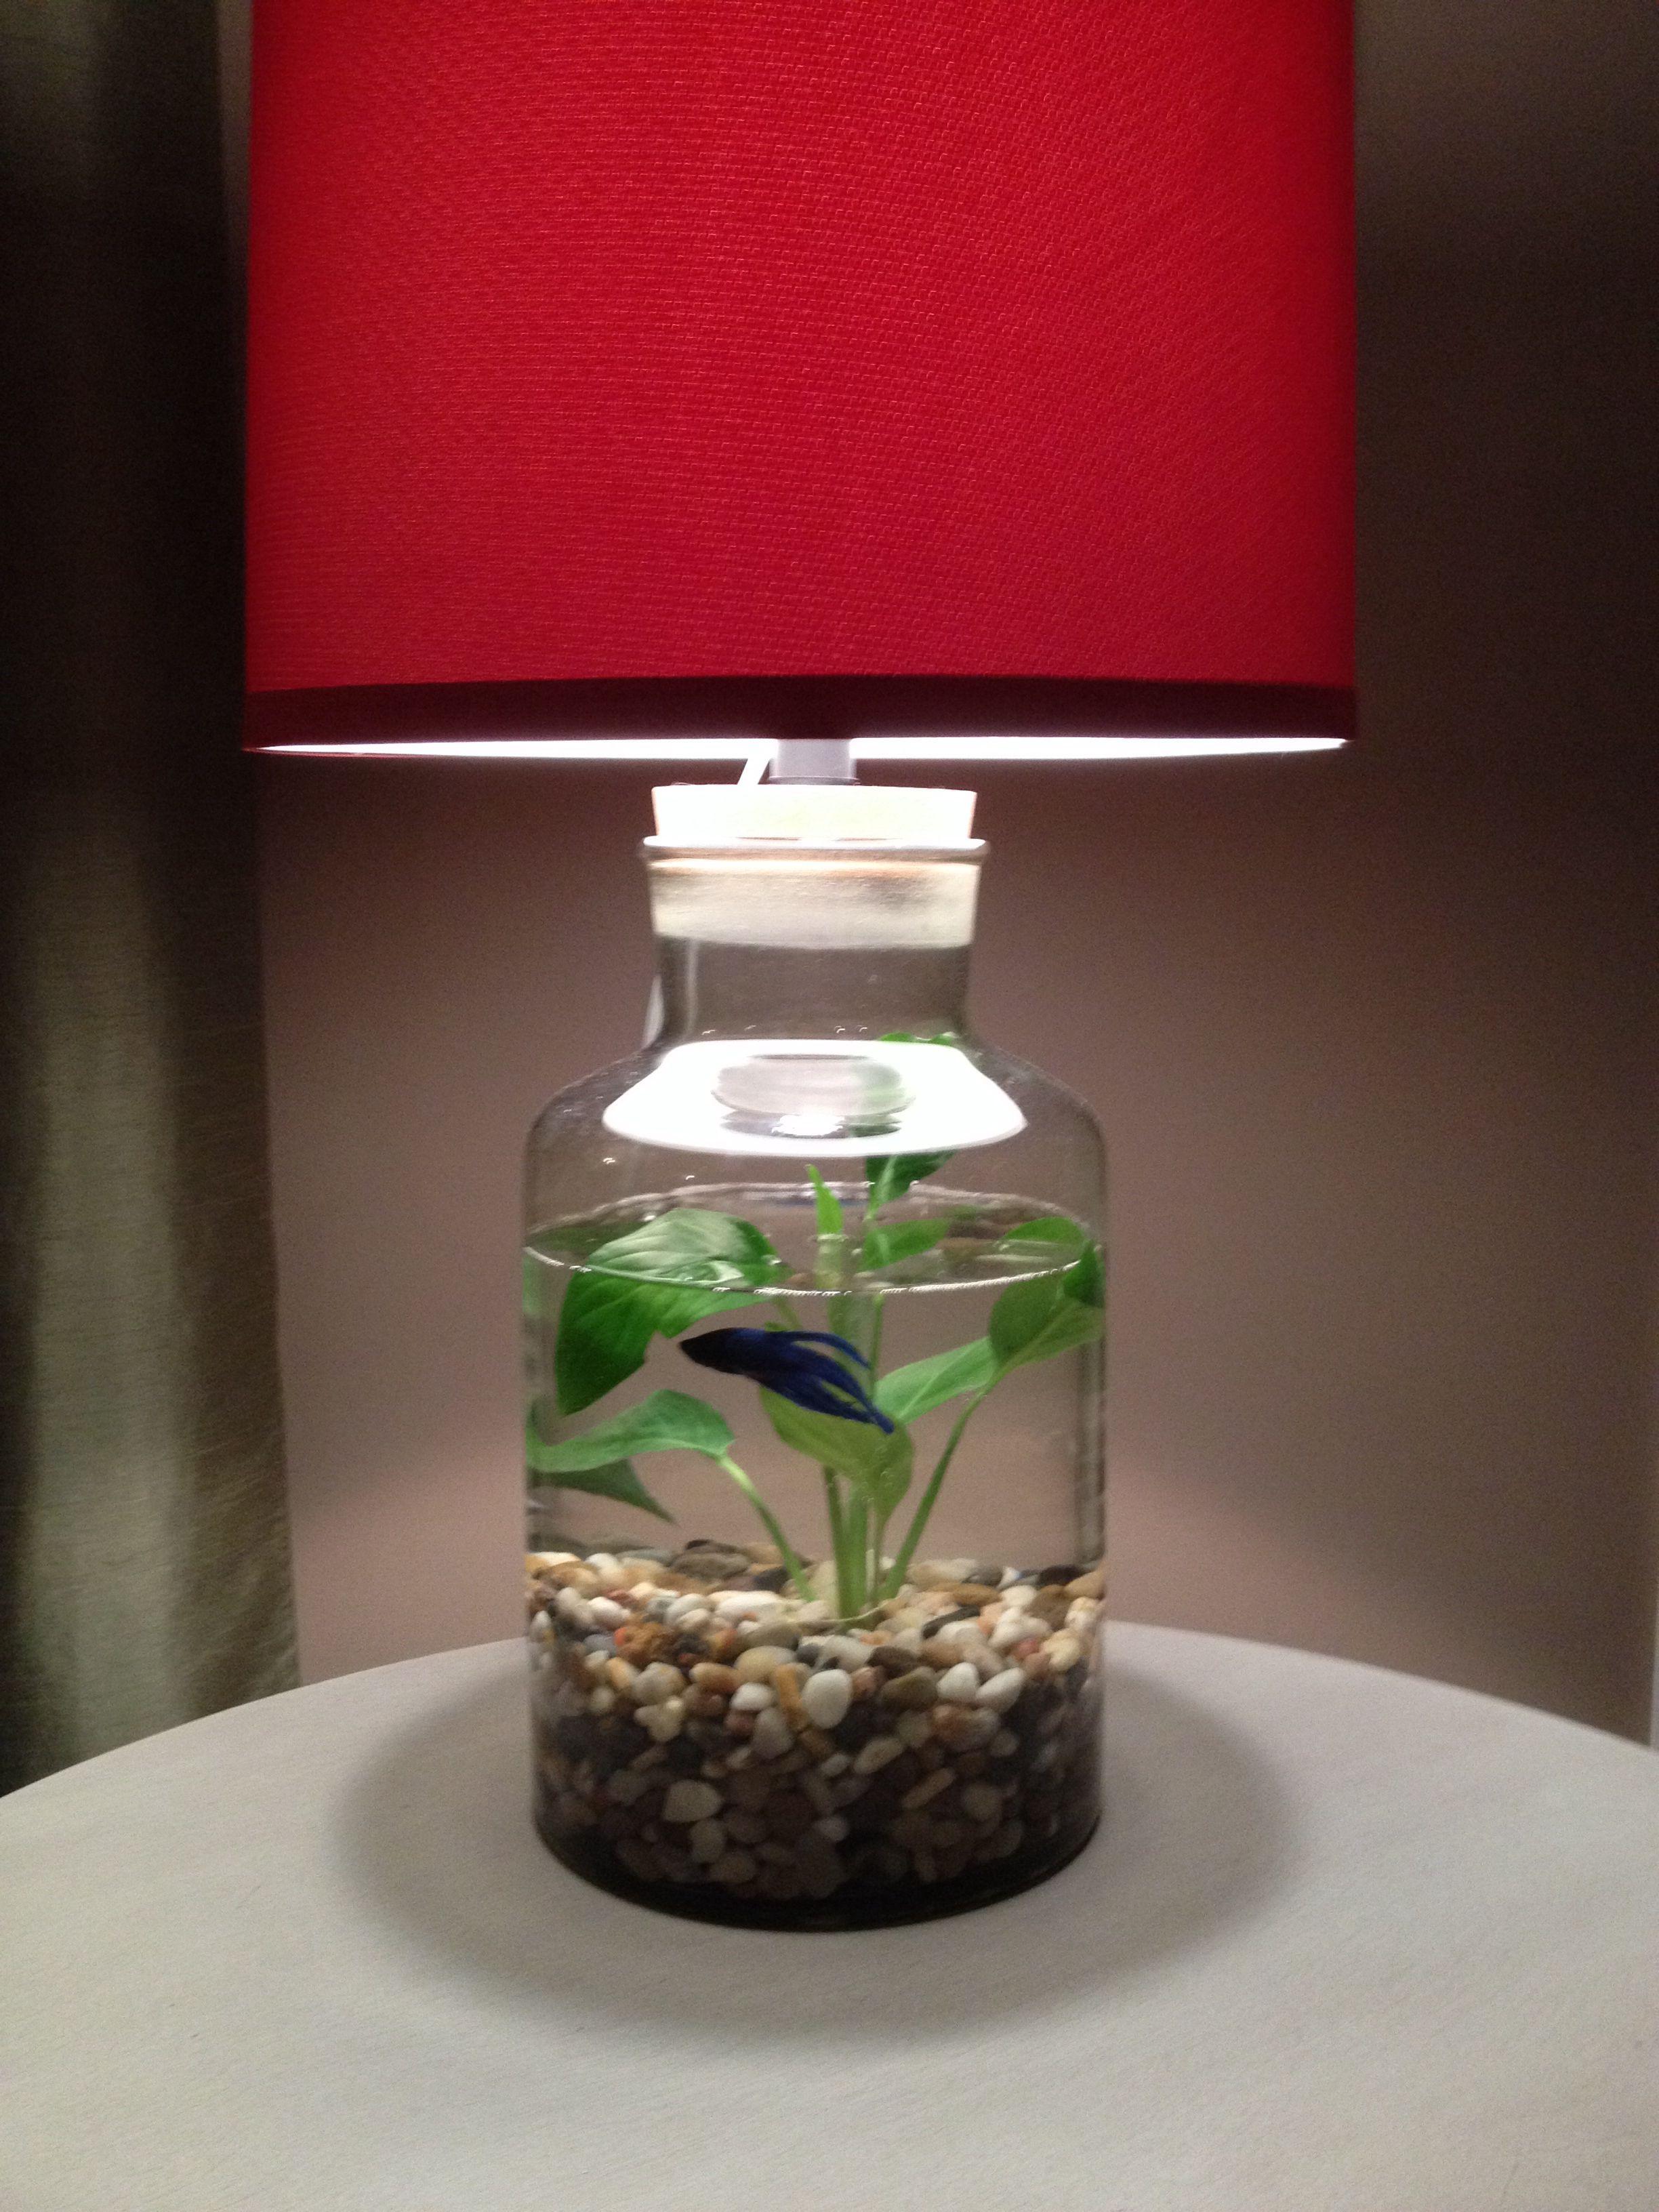 idea for a fillable lamp lamp ideas pinterest. Black Bedroom Furniture Sets. Home Design Ideas